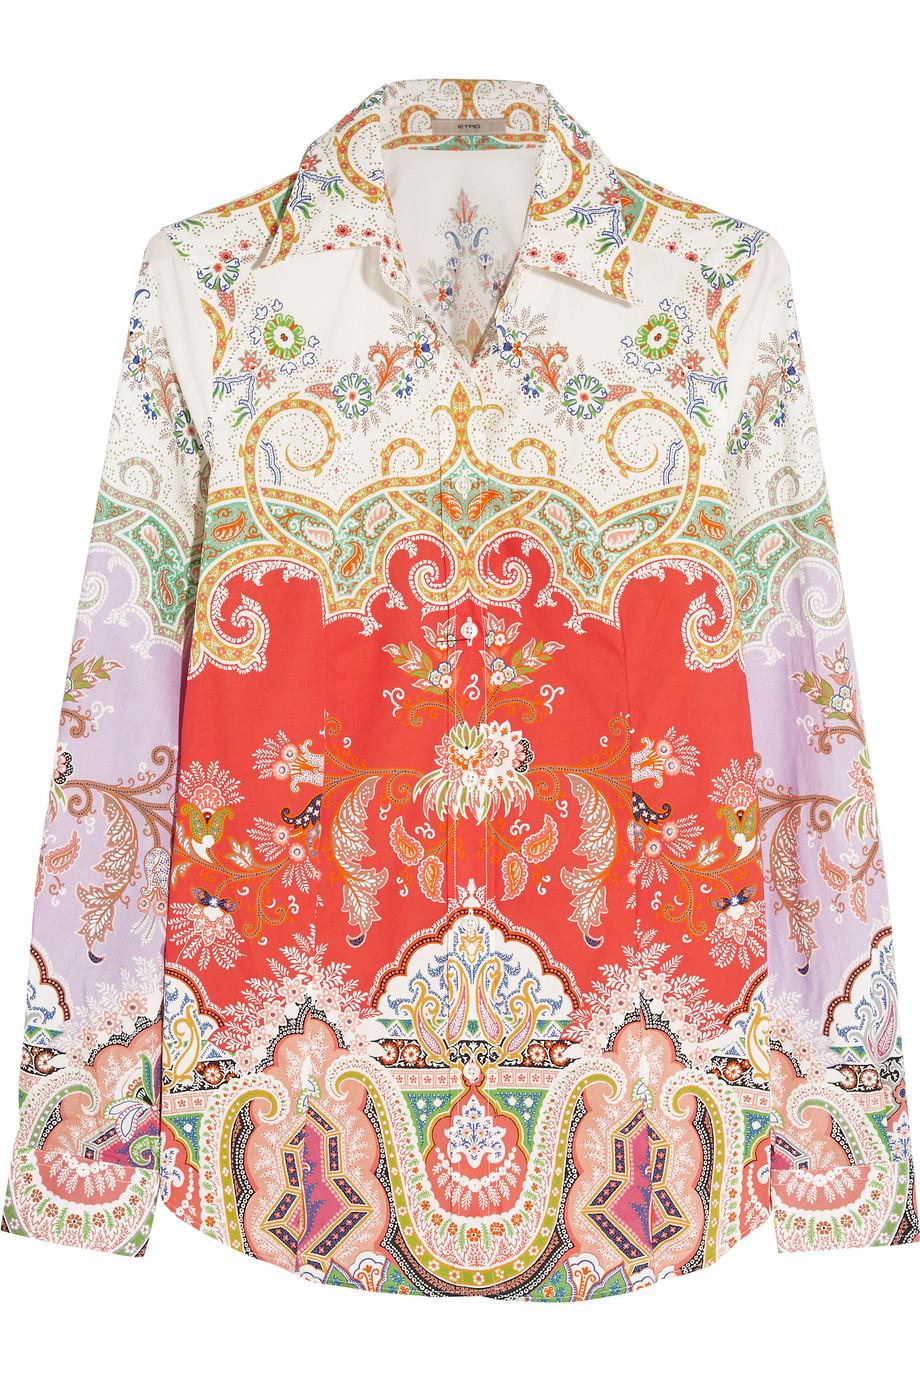 Etro Printed Stretch-Cotton Poplin Shirt, Size: 42